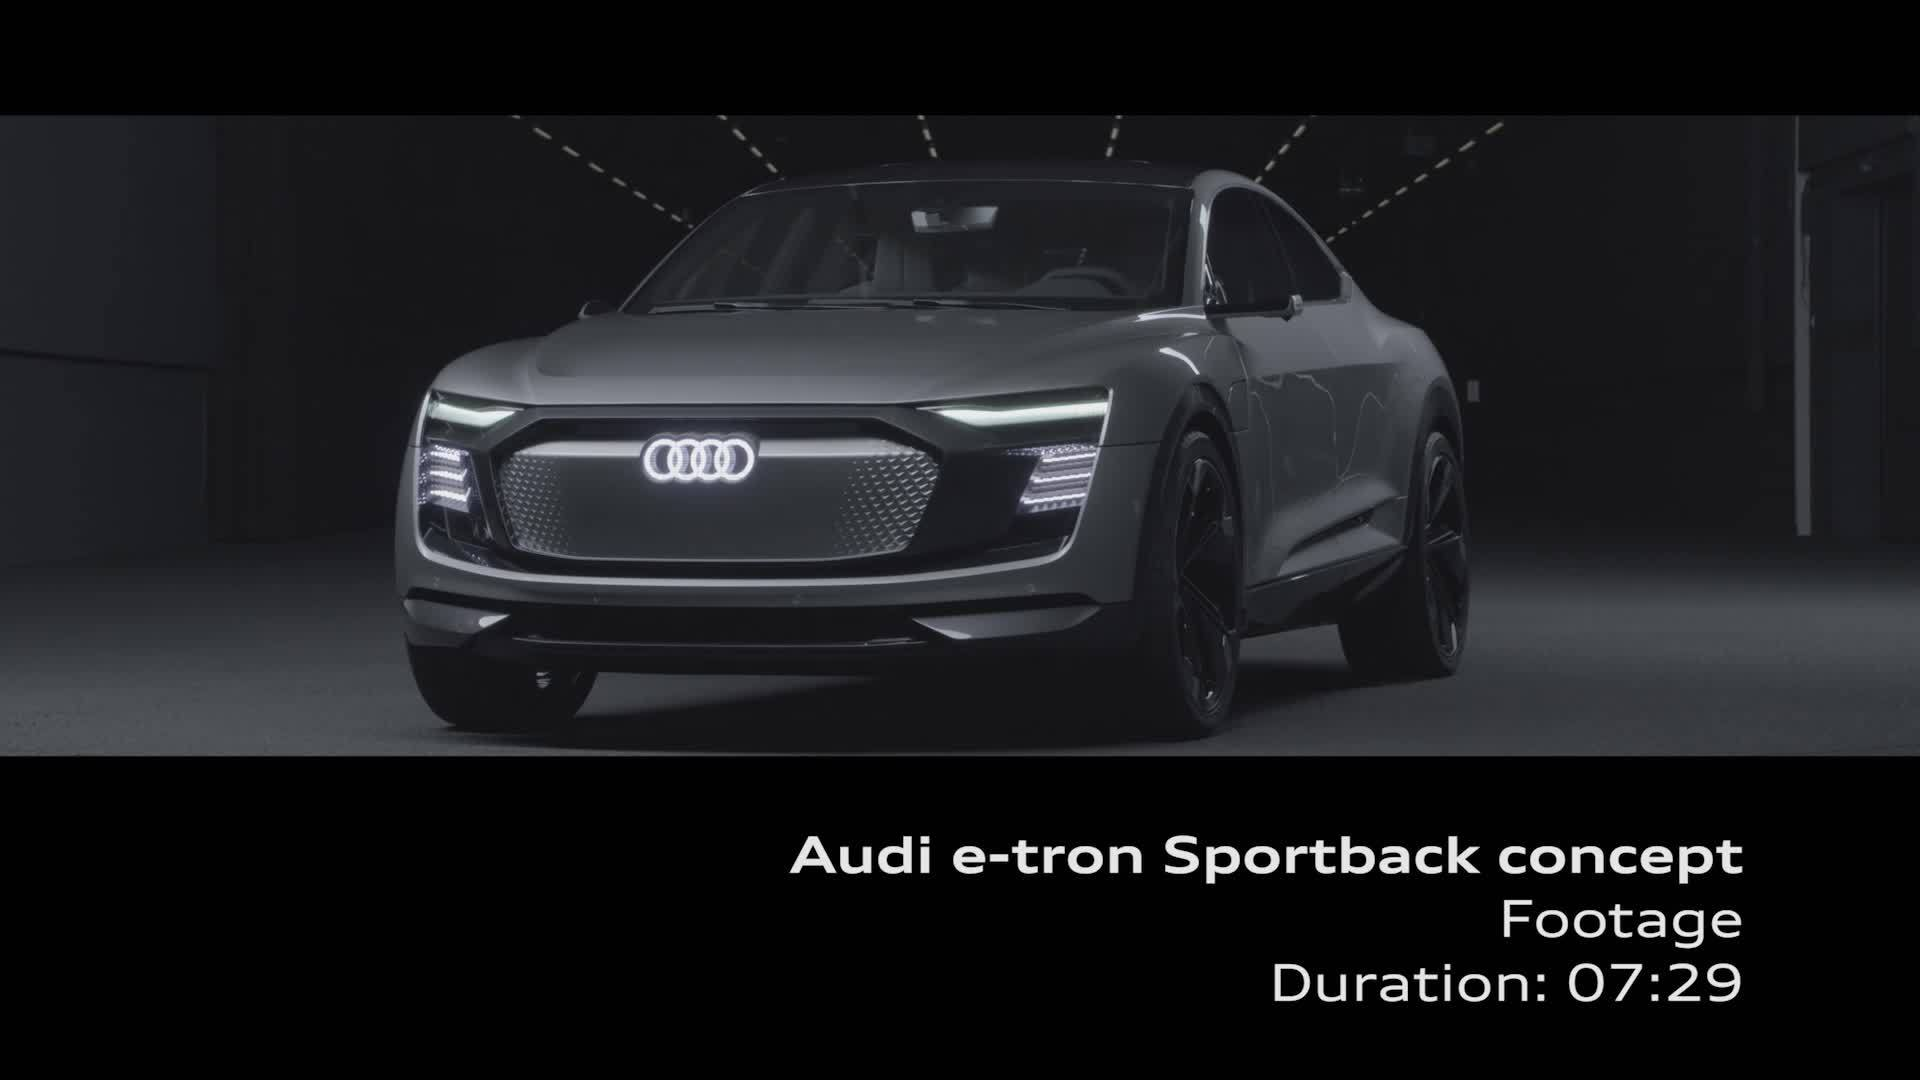 Audi e-tron Sportback concept - Footage